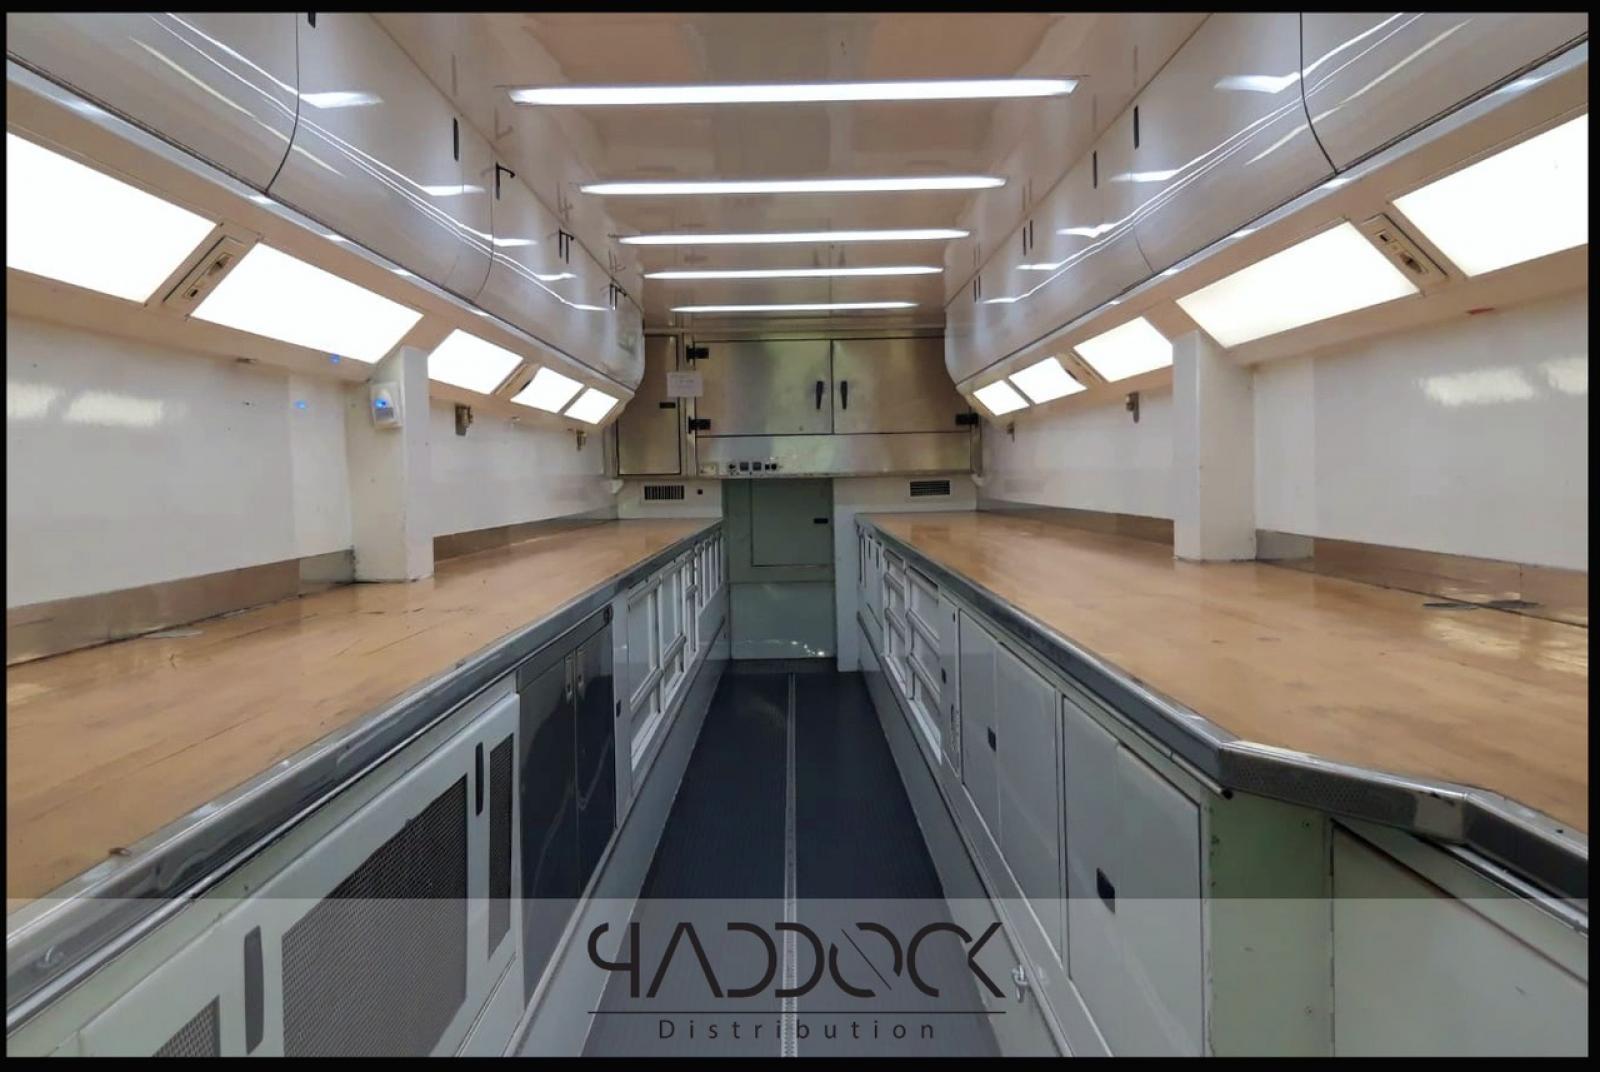 Used trailer WHEELBASE ENGINEERING by Paddock Distribution - 3